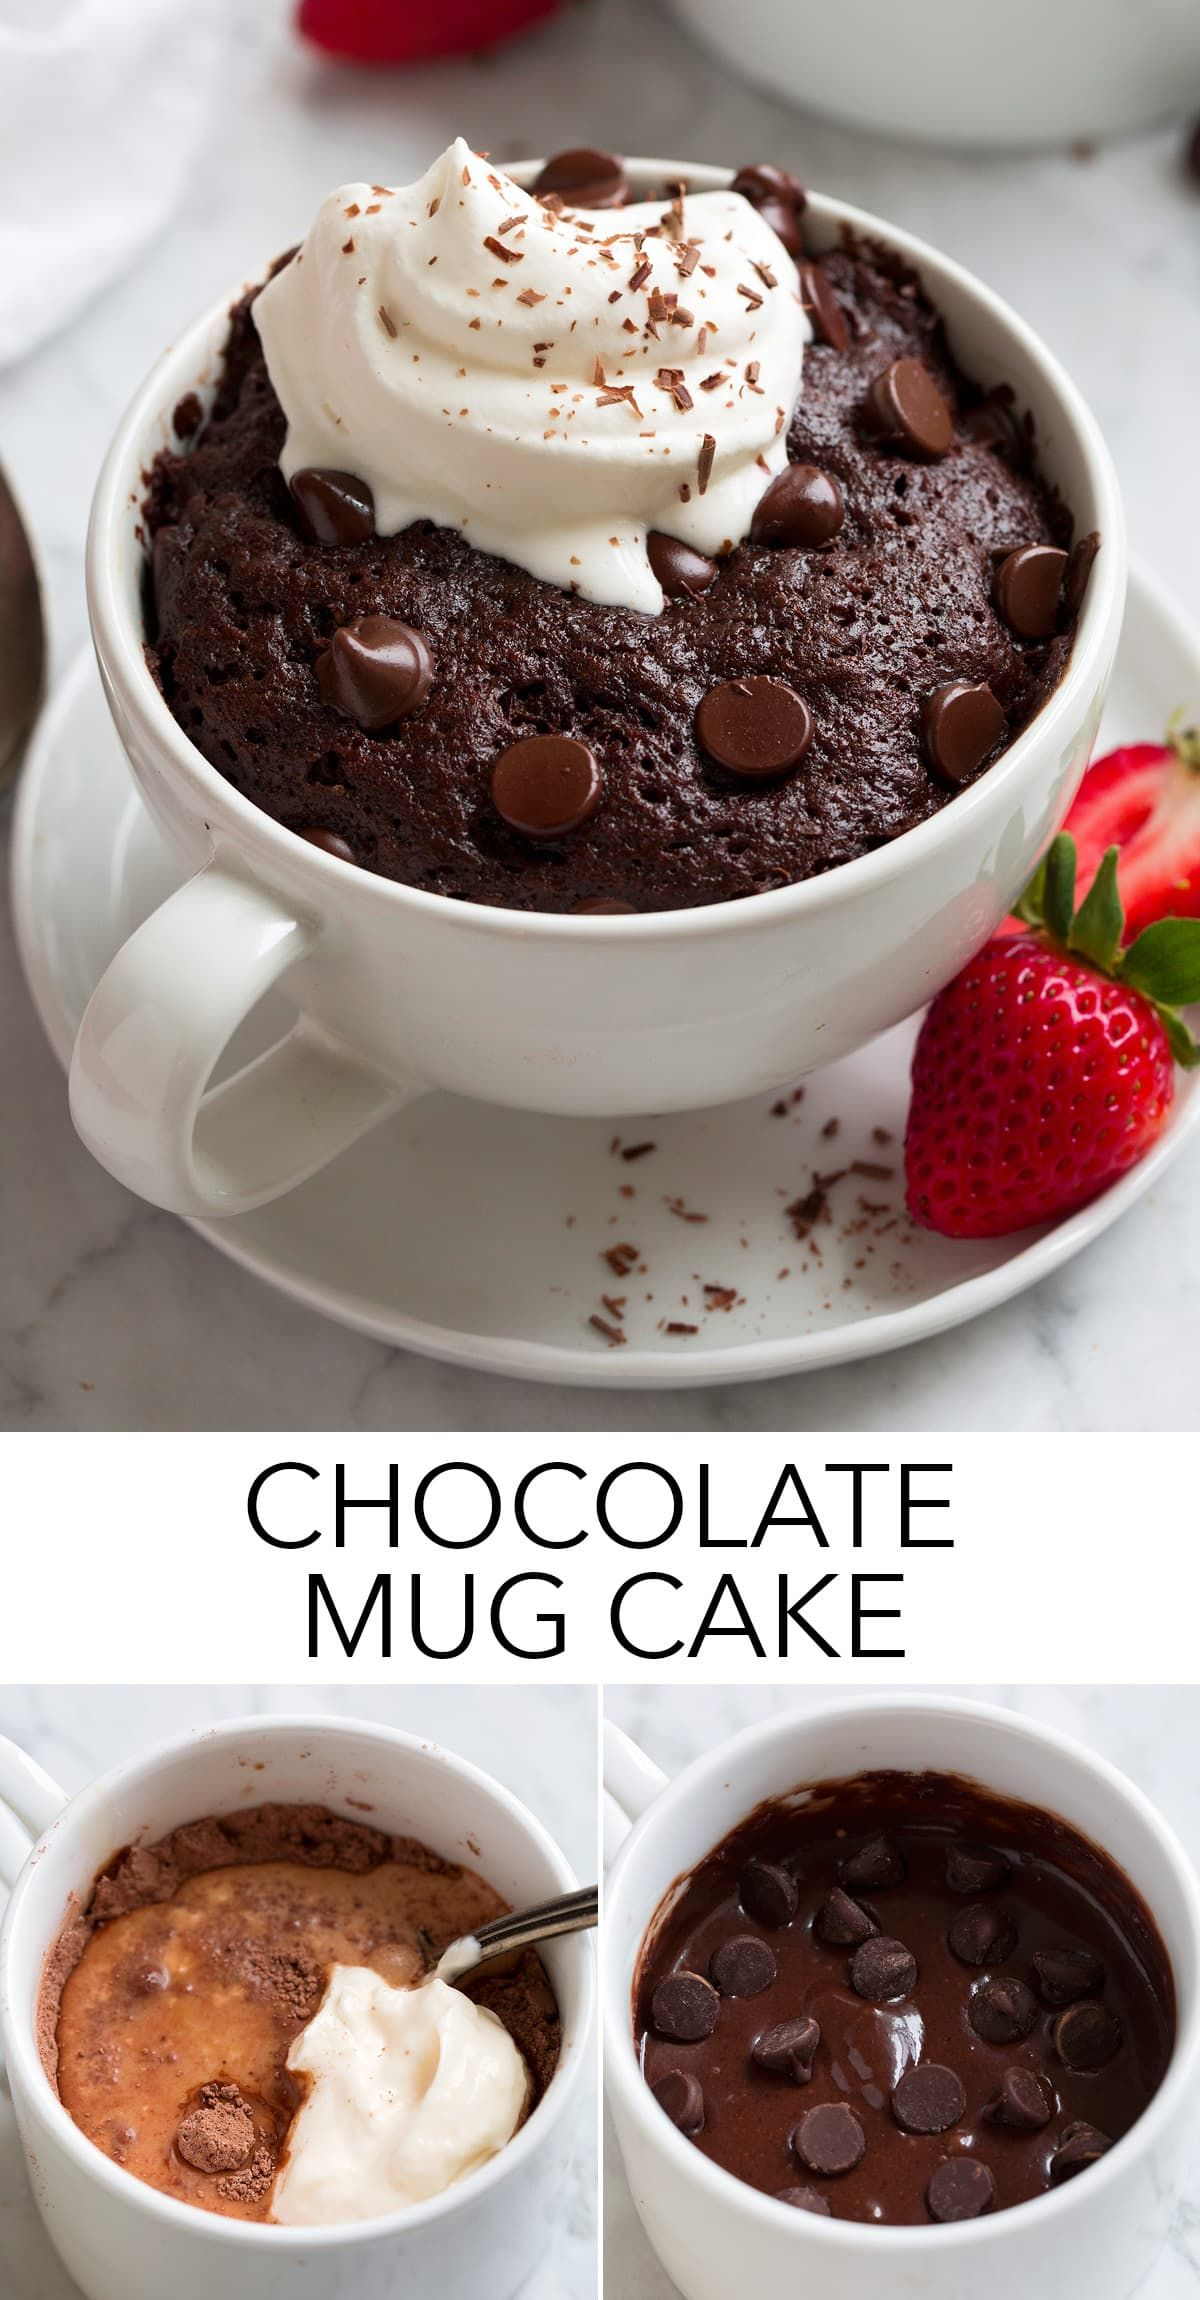 Microwave Chocolate Mug Cake The Ultimate Super Fast And